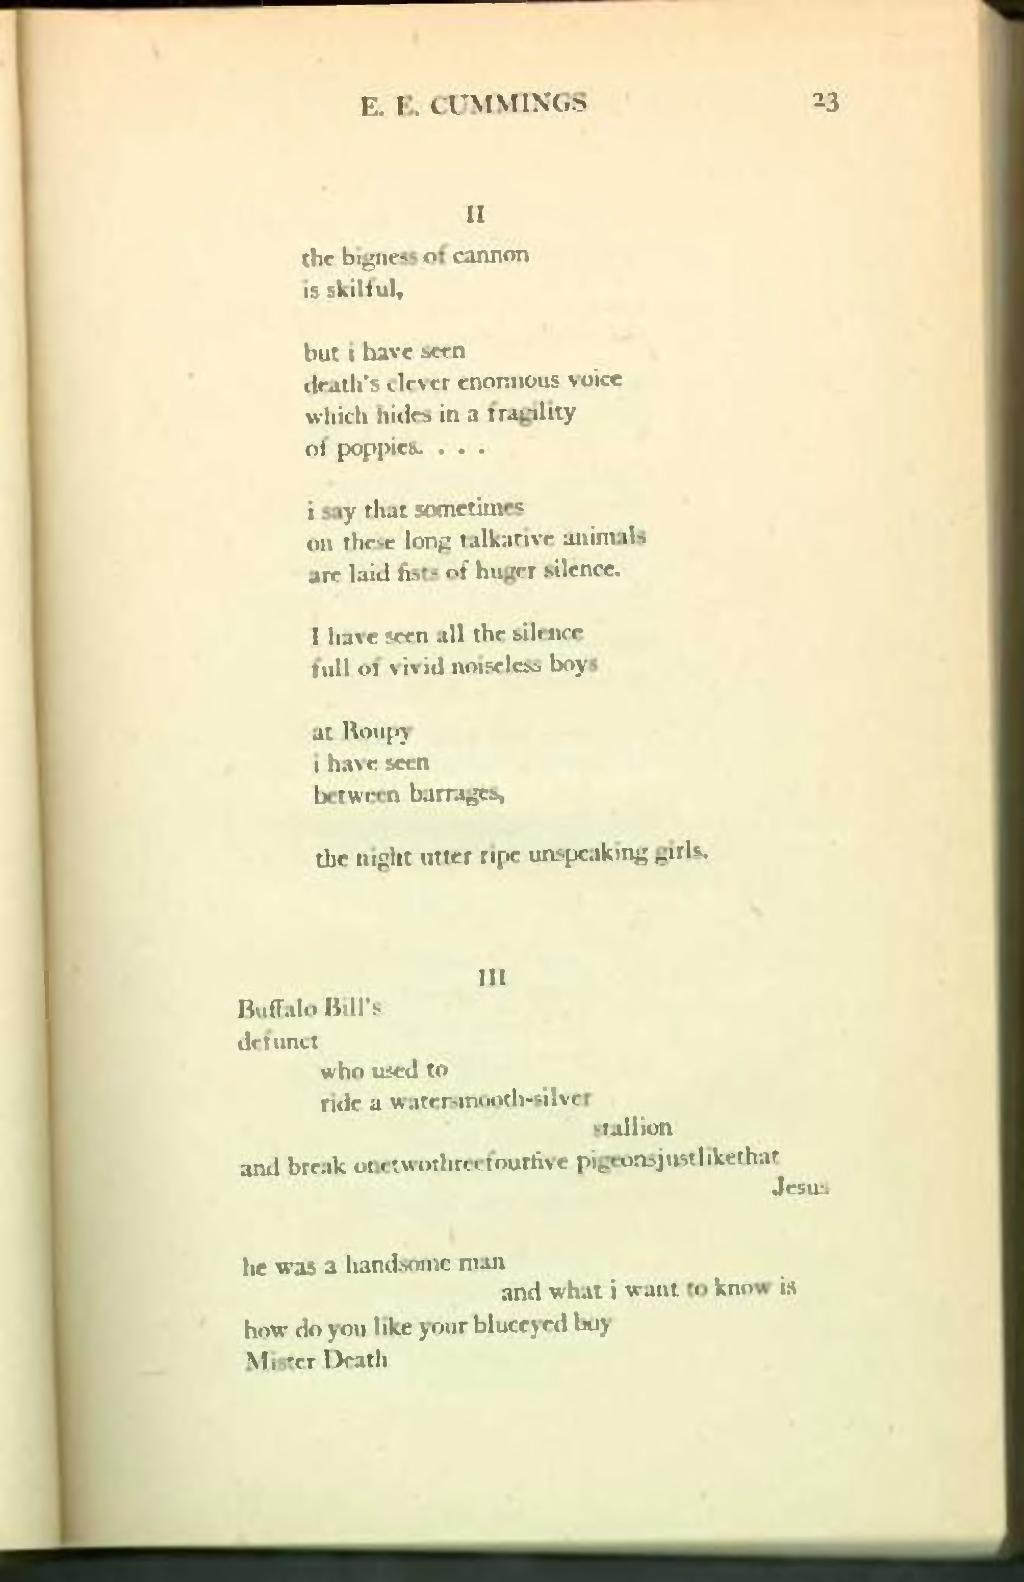 page seven poems  e  e  cummings  1920 djvu  2